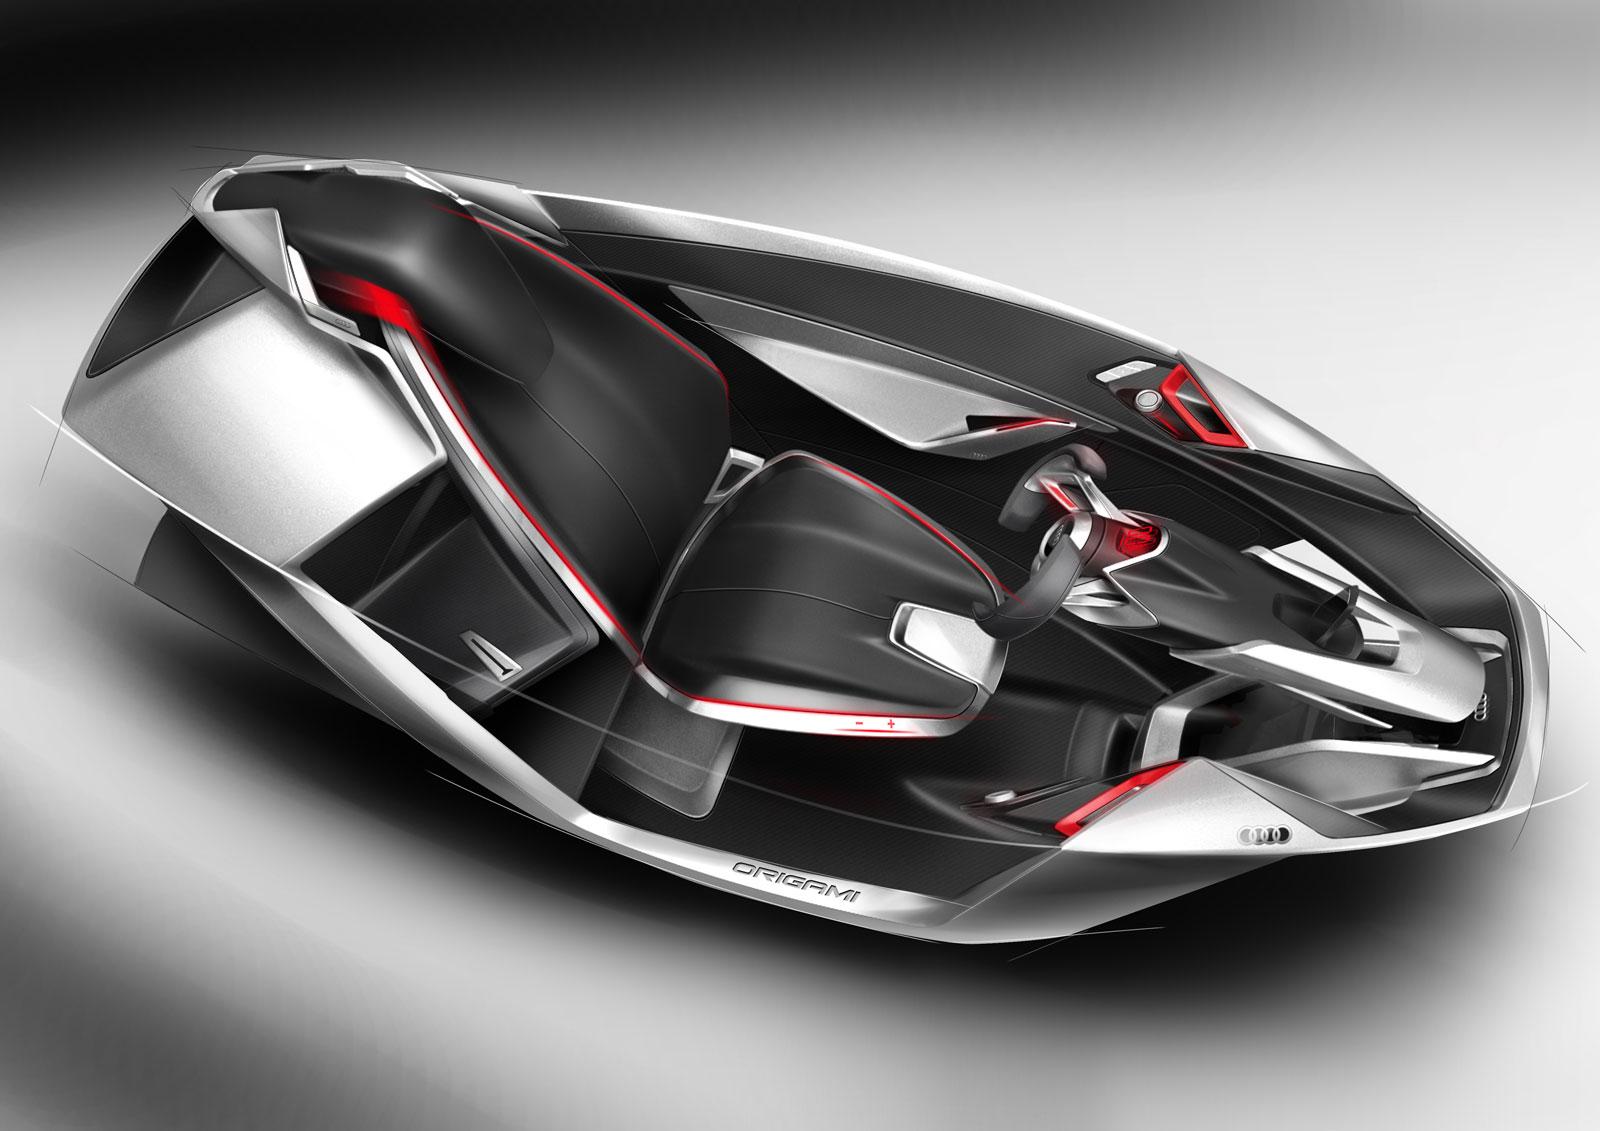 Mini Cooper Interior >> SPD - Concept Car Interior Design Sketches - Car Body Design